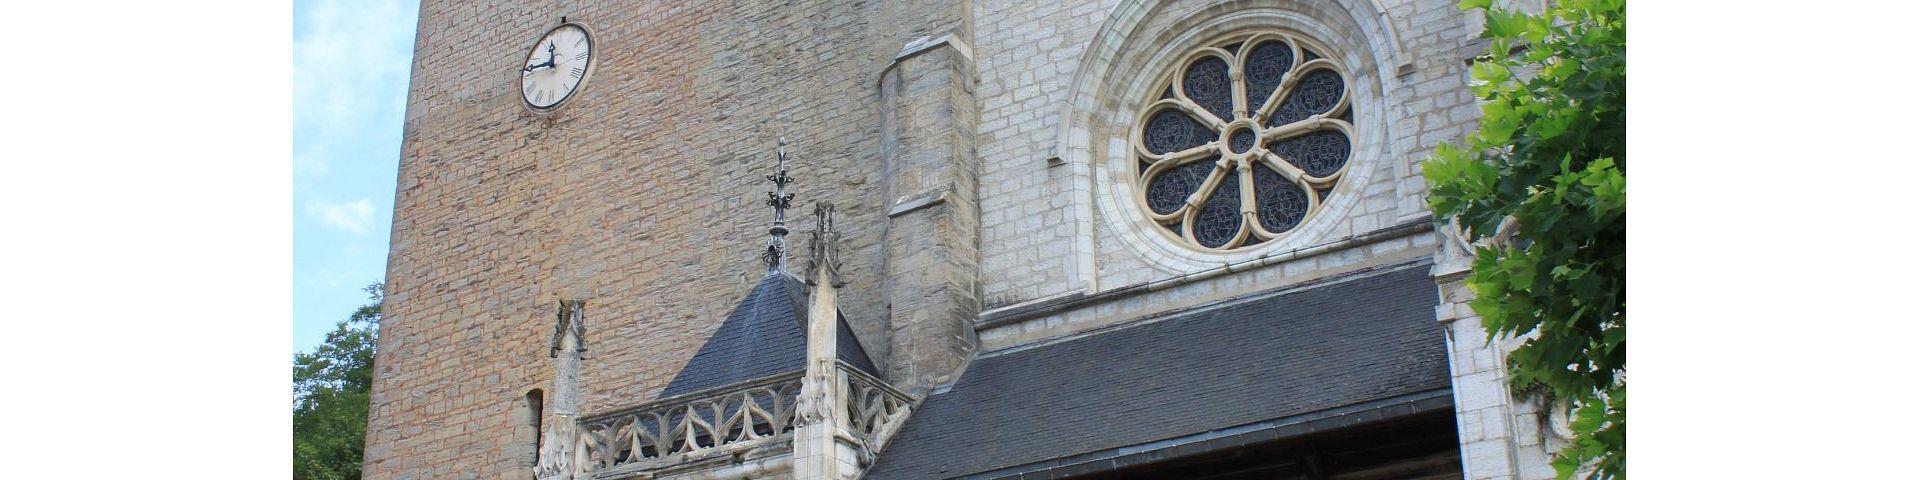 Salins-les-Bains - Eglise St-Anatoile (39)